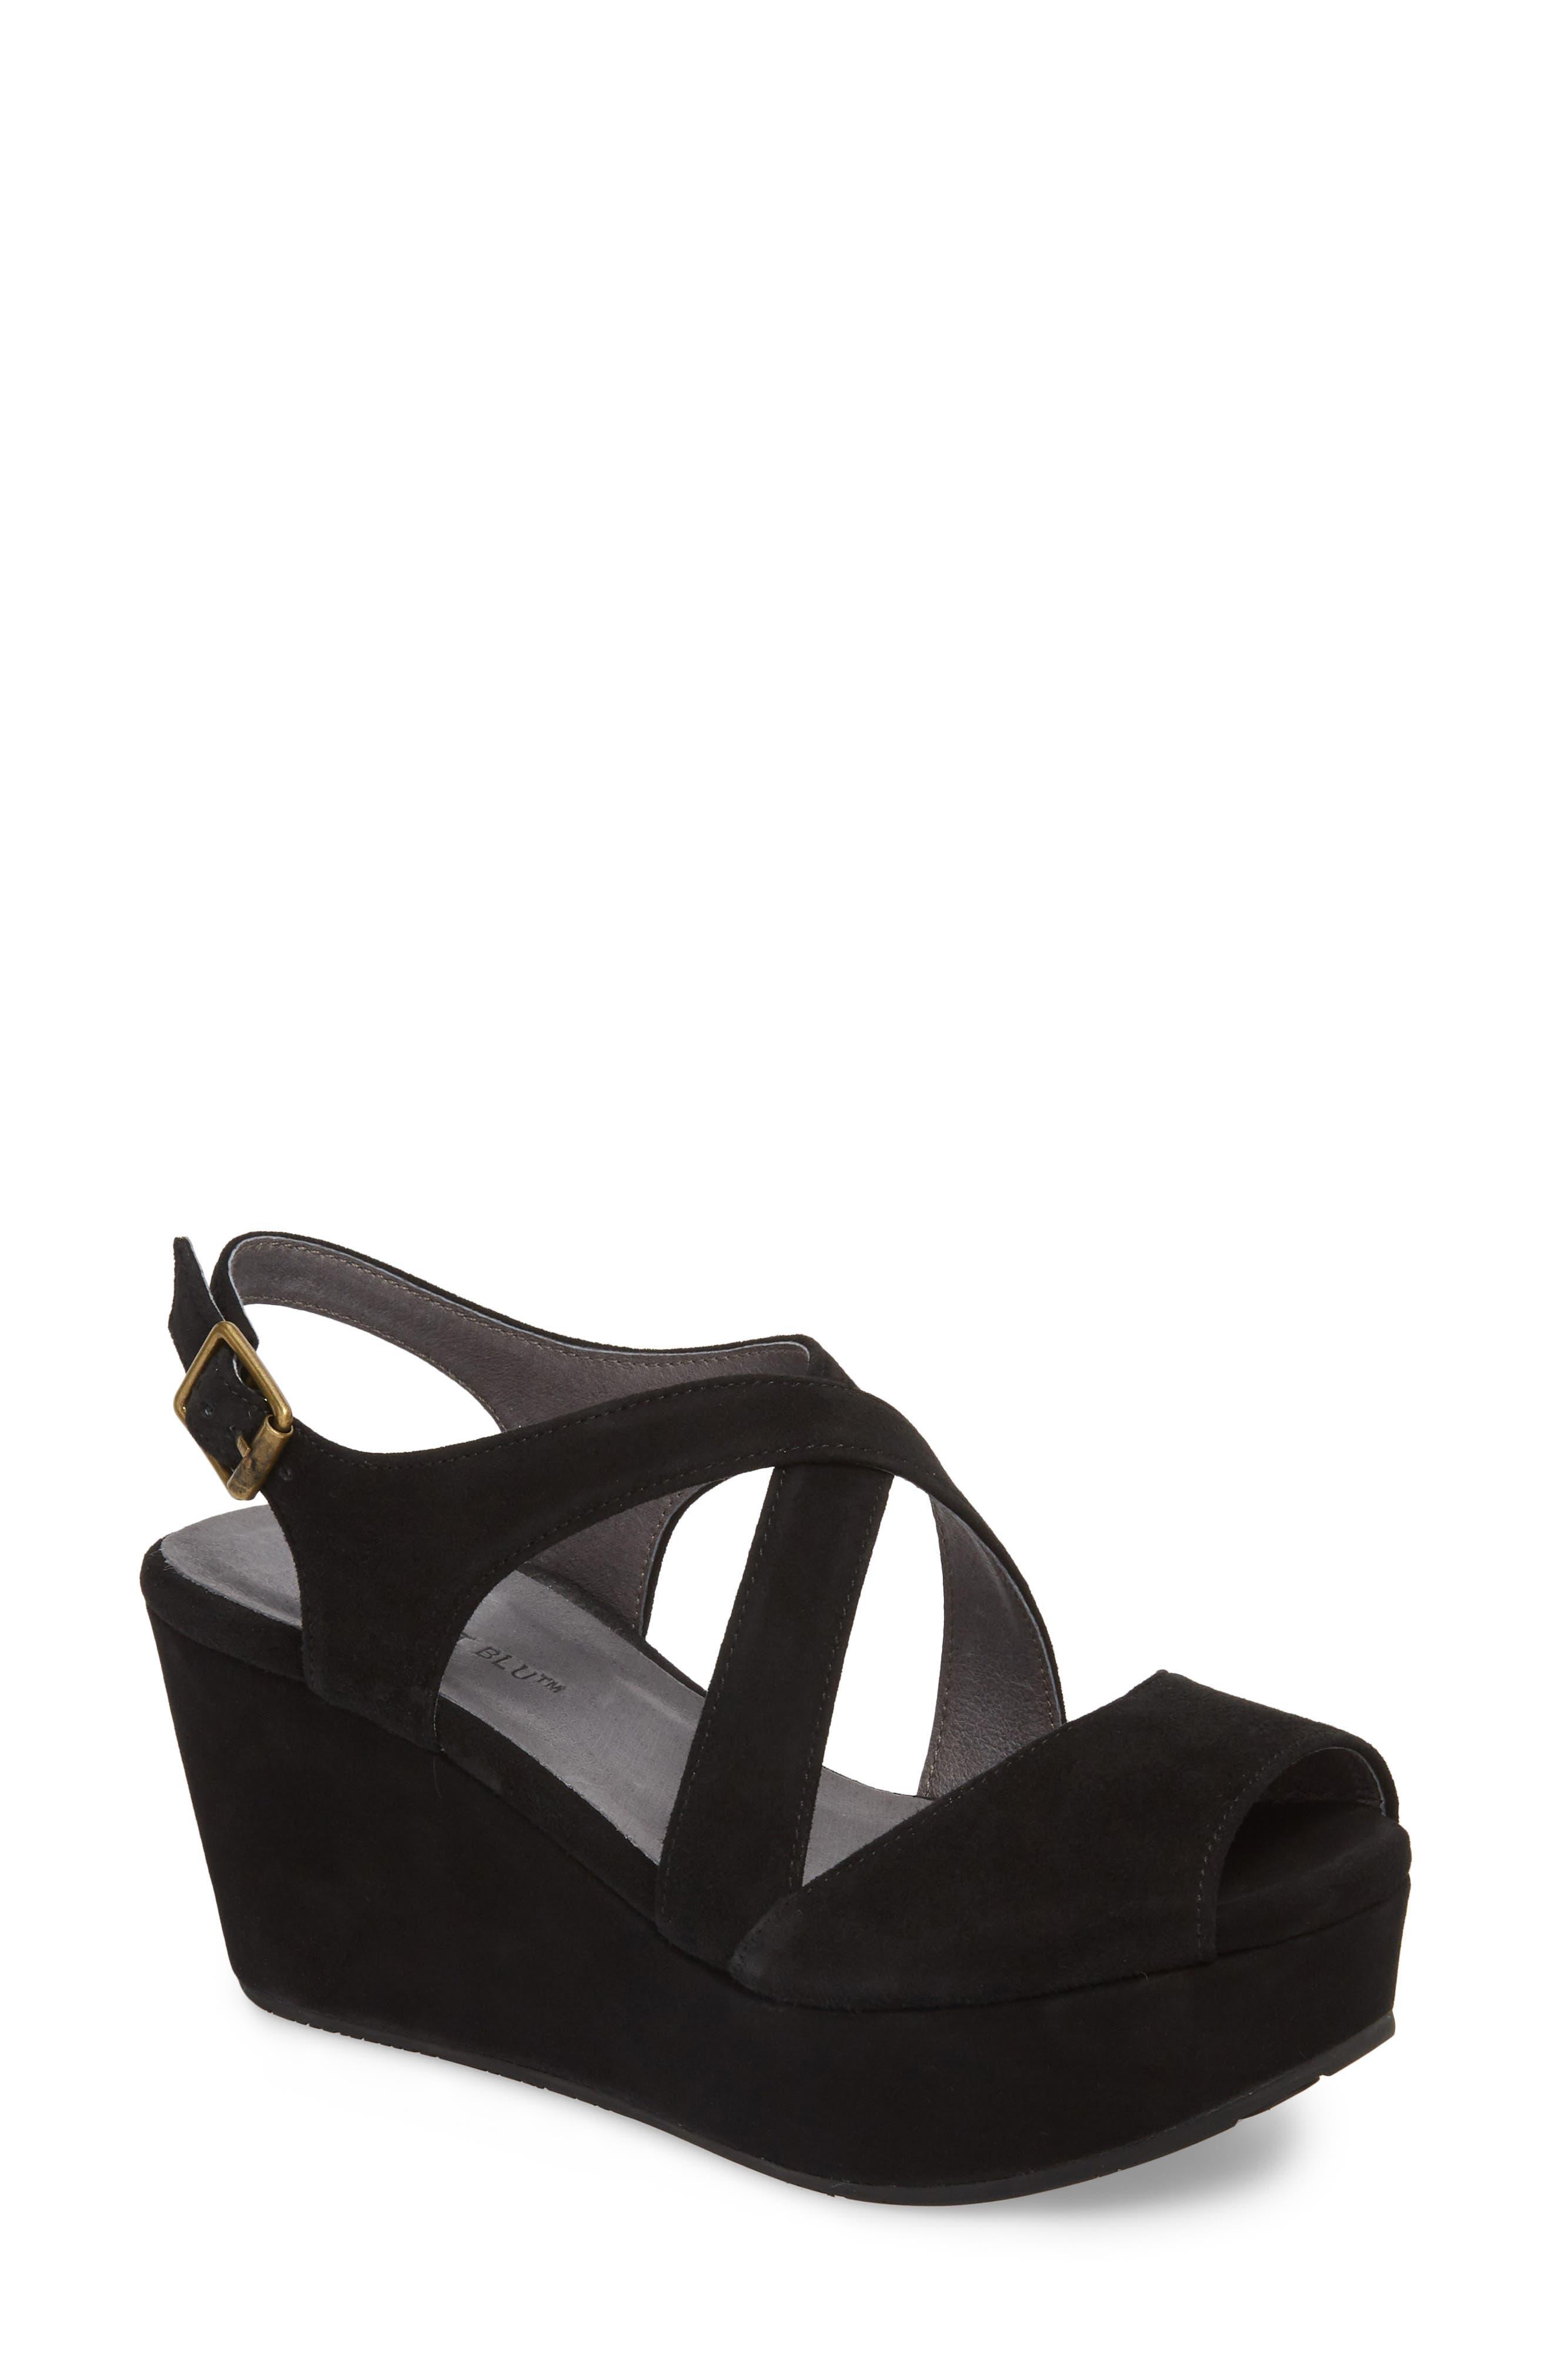 CHOCOLAT BLU, Winnie Wedge Sandal, Main thumbnail 1, color, BLACK SUEDE